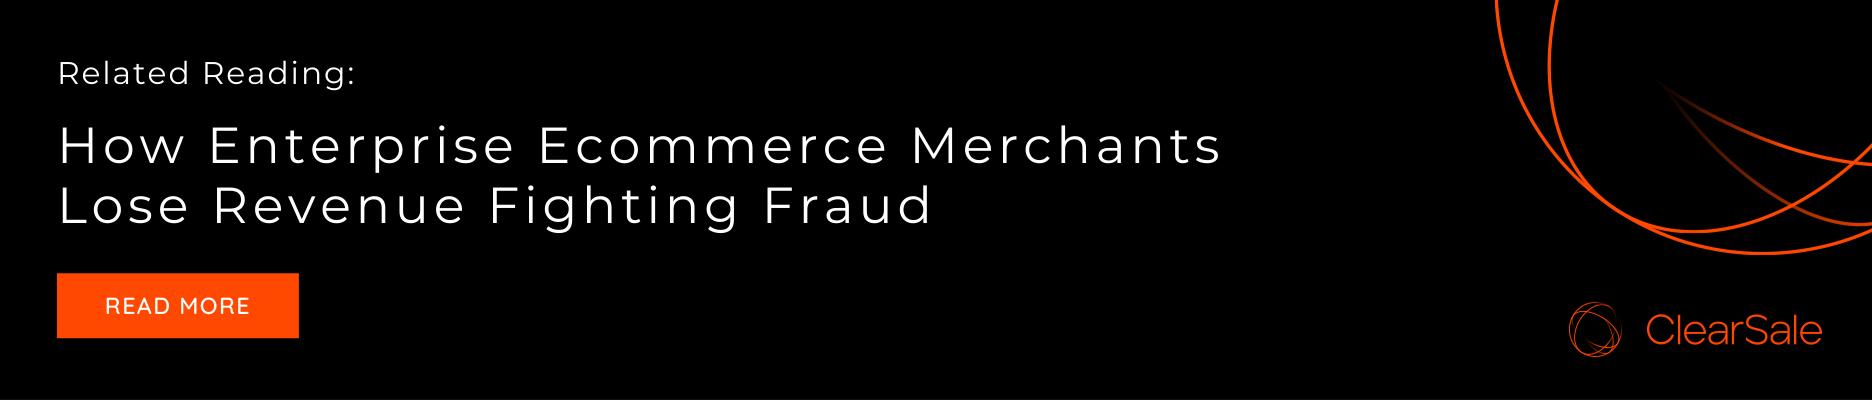 Related Reading: How Enterprise Ecommerce Merchants Lose Revenue Fighting Fraud